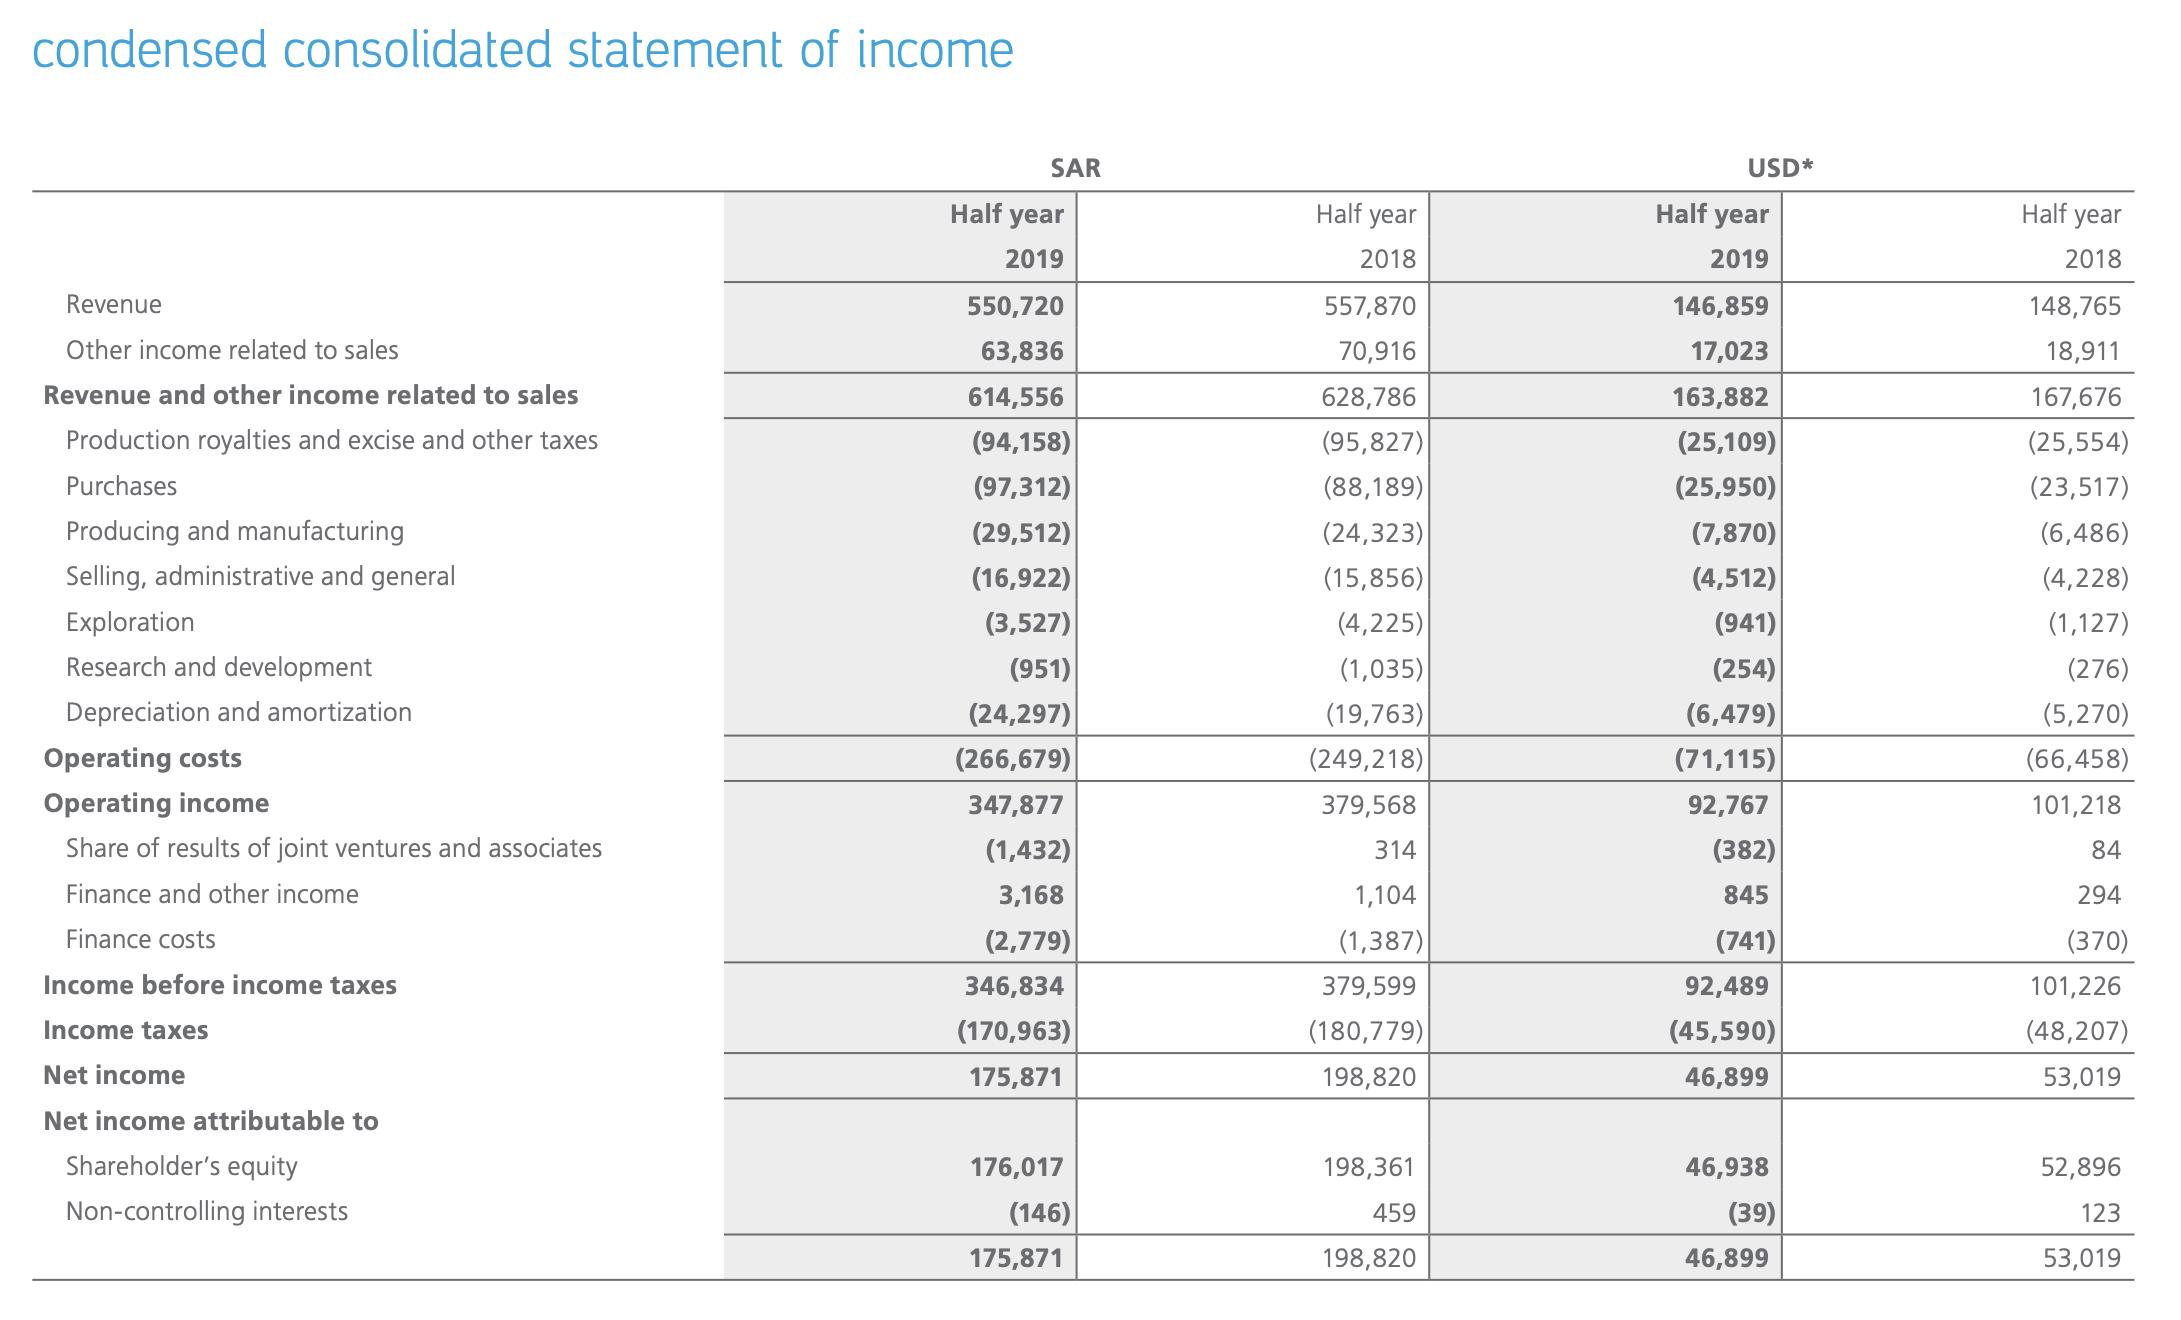 Saudi-Aramco Halbjahreszahlen